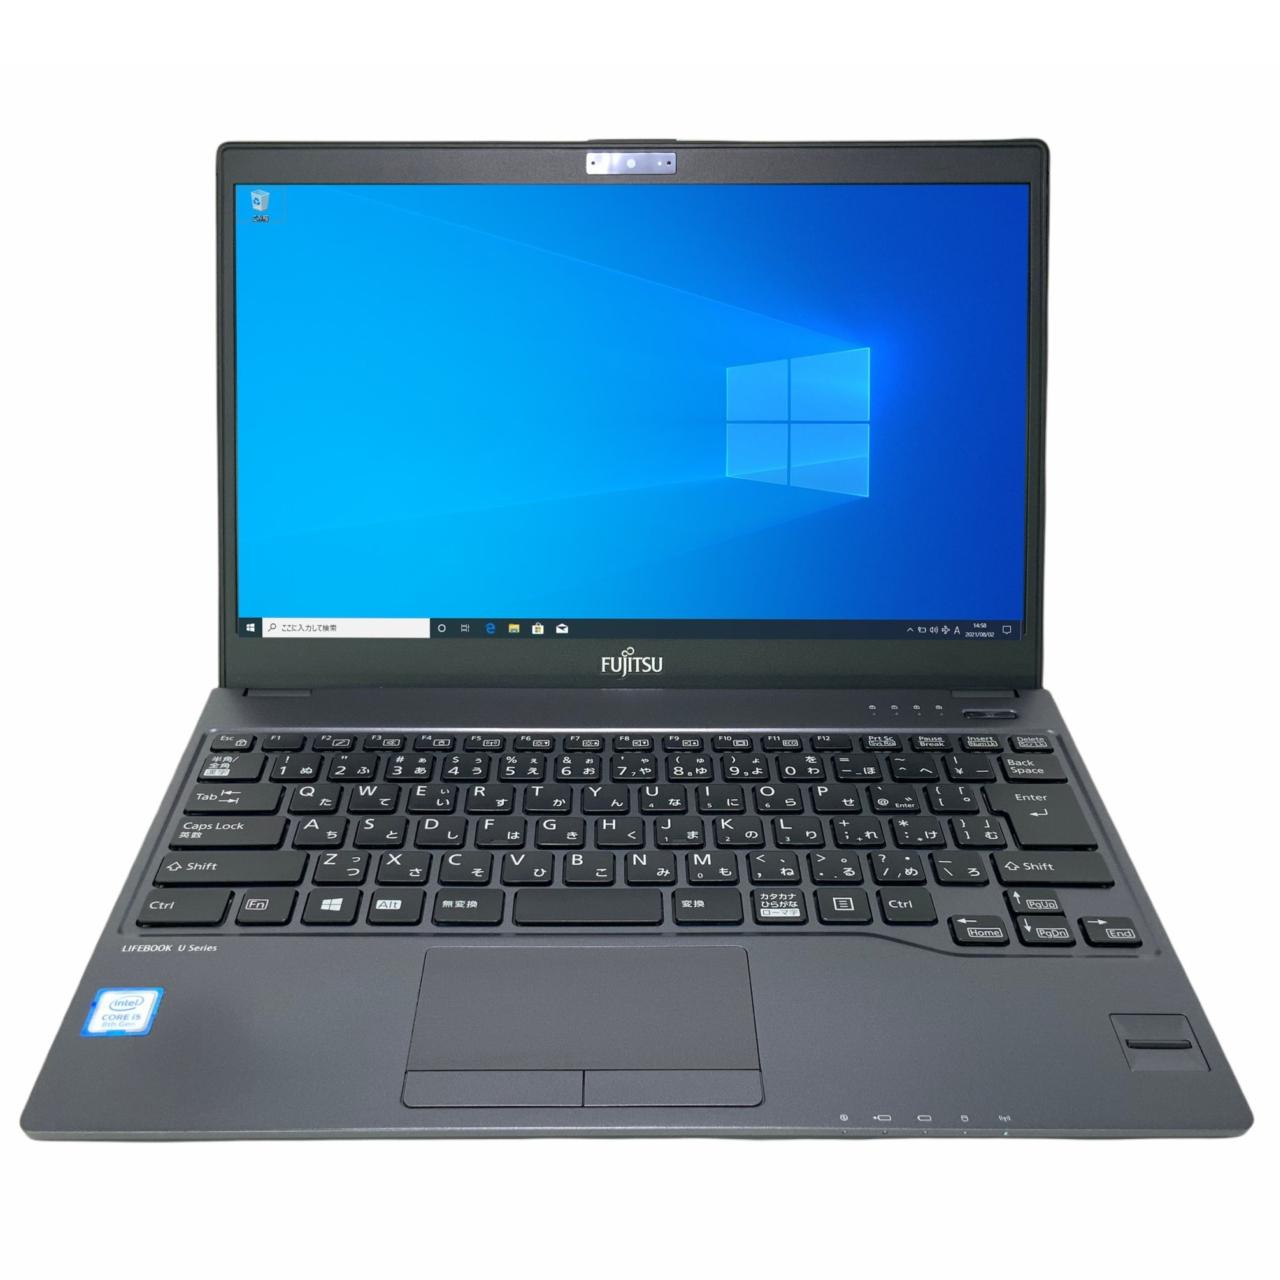 FUJITSU LIFEBOOK U938 S Core i5 4GB 新品SSD960GB 無線LAN フルHD 新品 カメラ 13.3インチ Office 64bit 国産品 中古パソコン 中古 Notebook ノートパソコン Windows10 WPS